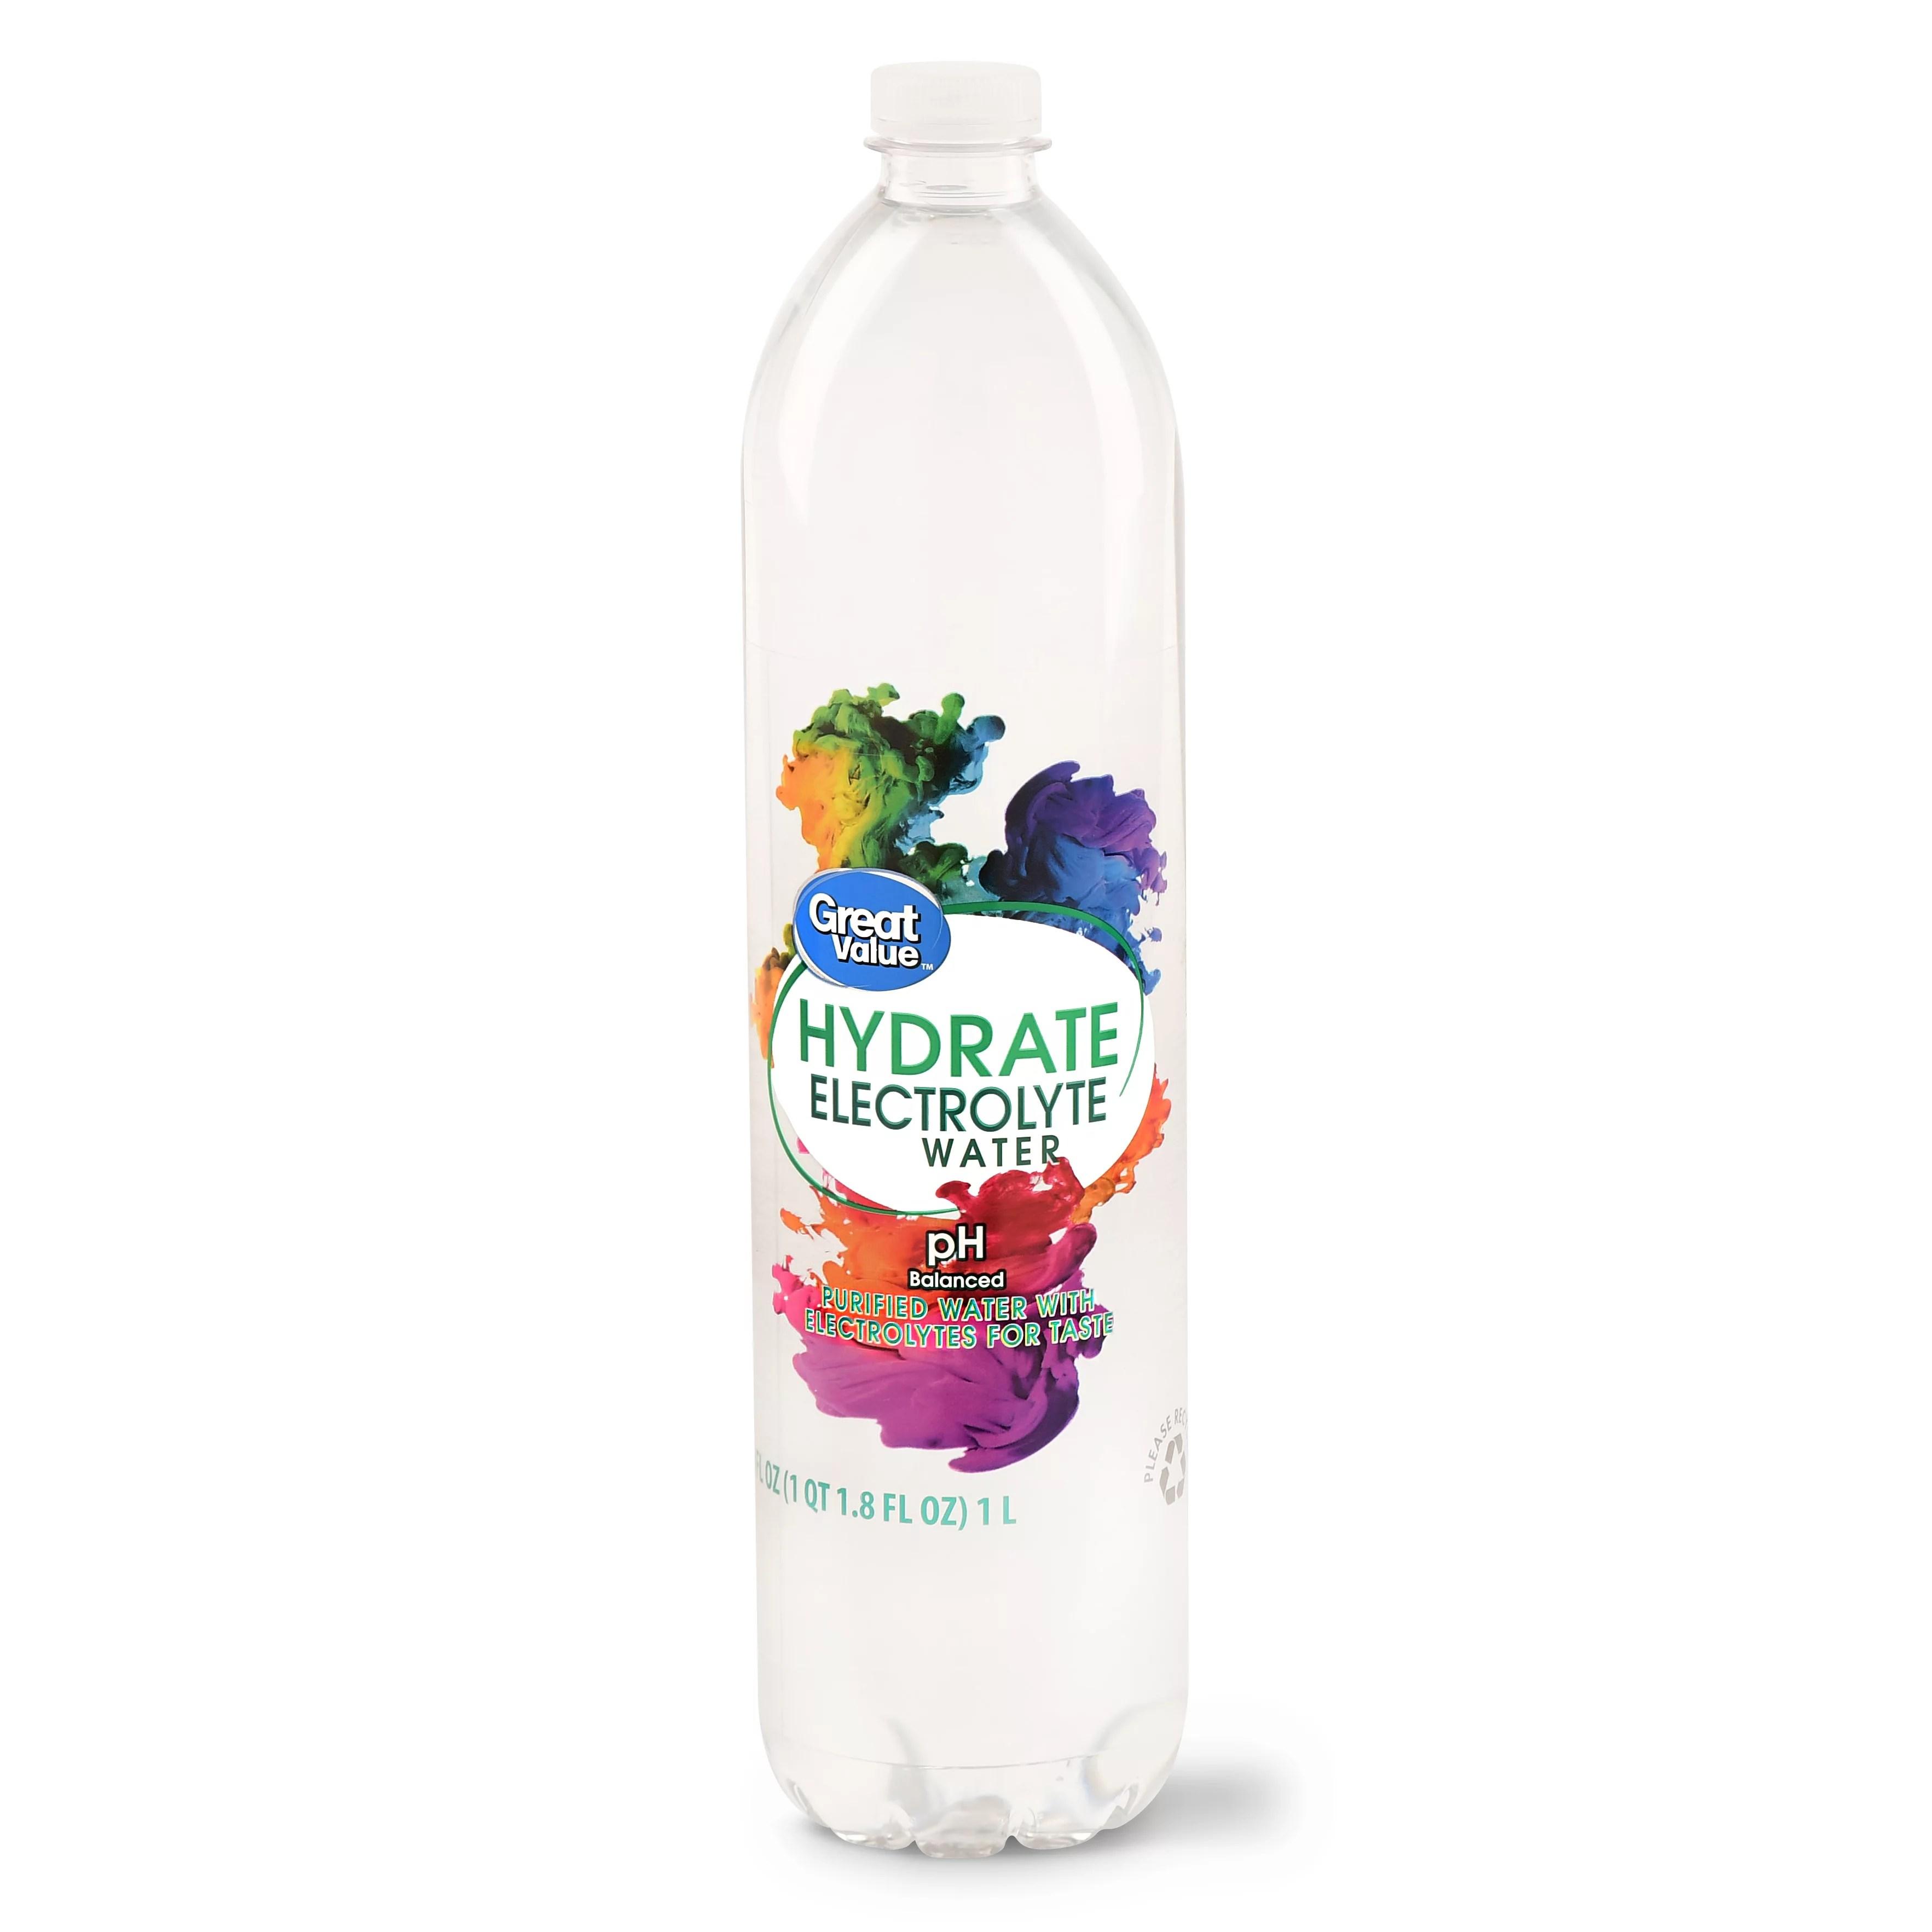 Great Value Hydrate Electrolyte Water 1 Liter - Walmart.com